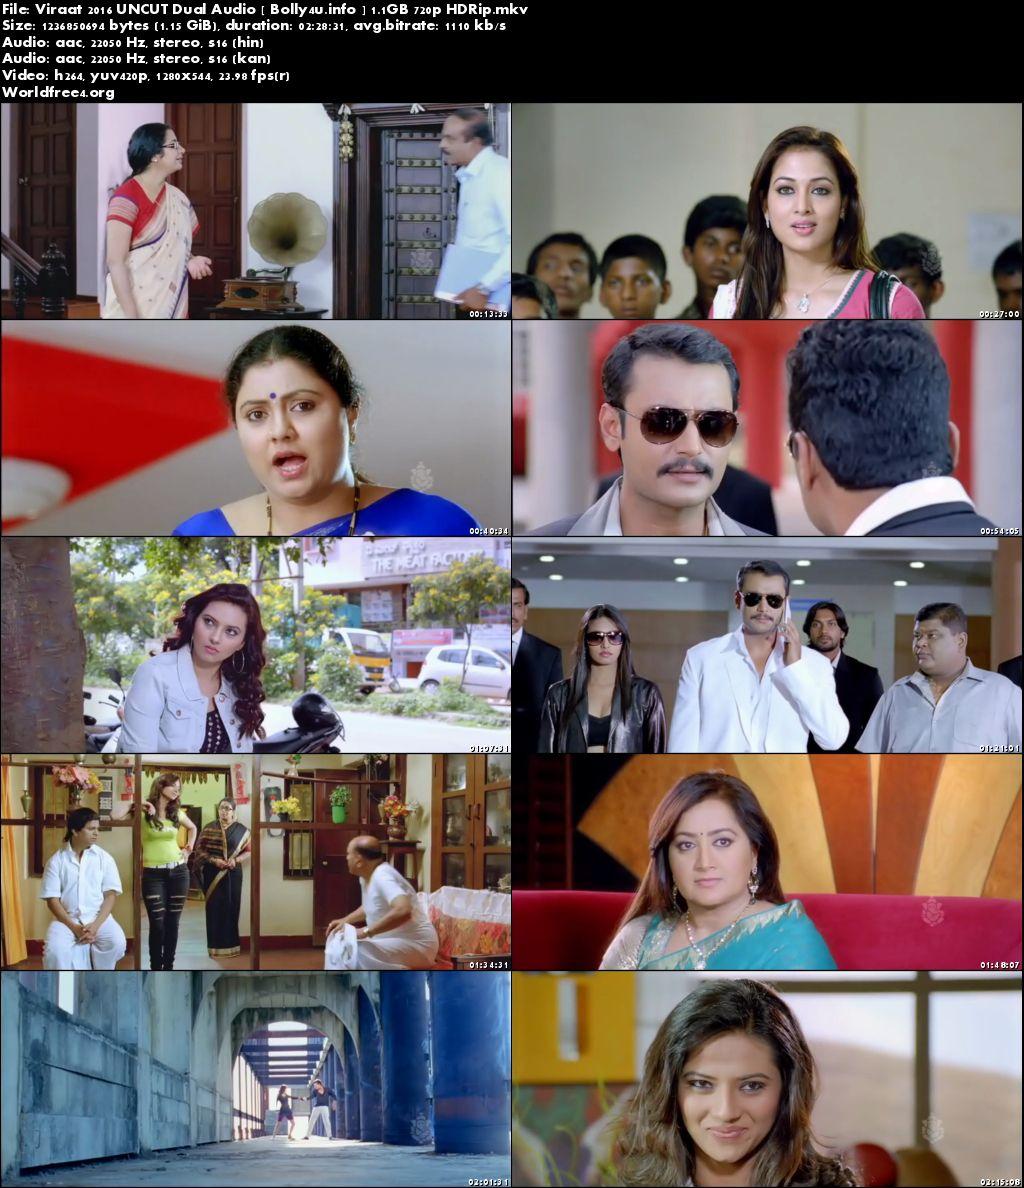 Screen Shoots of Watch Online Viraat 2016 HDRip 450Mb UNCUT Hindi Dual Audio 480p Free Download Bolly4u.info